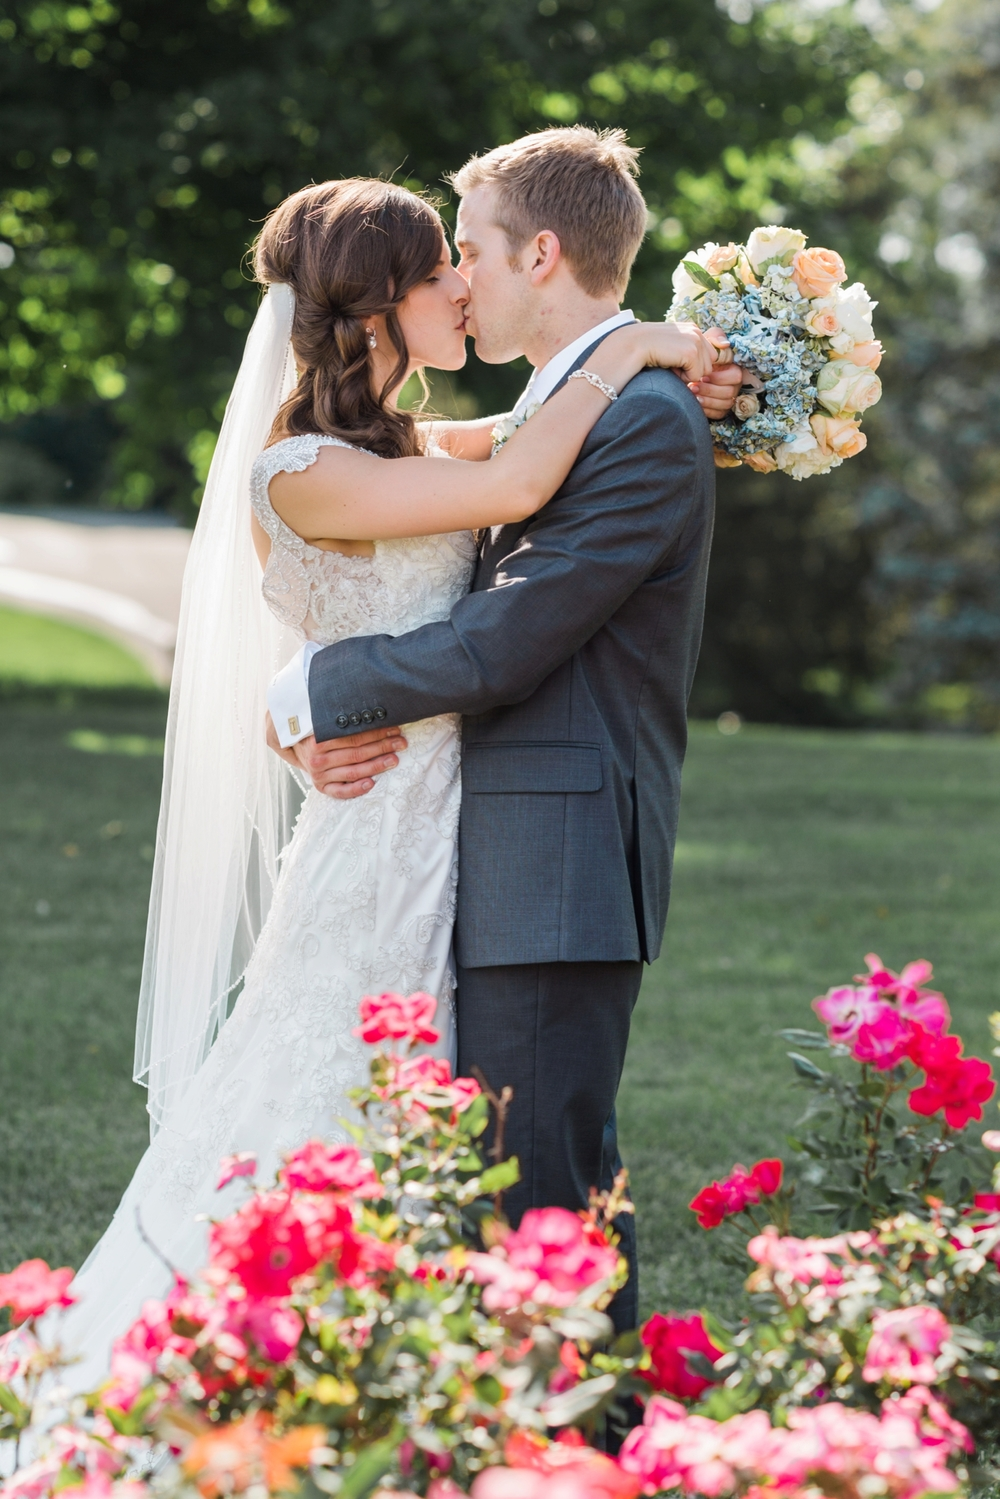 NCR_Country_Club_Kettering_Ohio_Wedding_Photography_Chloe_Luka_Photography_7182.jpg